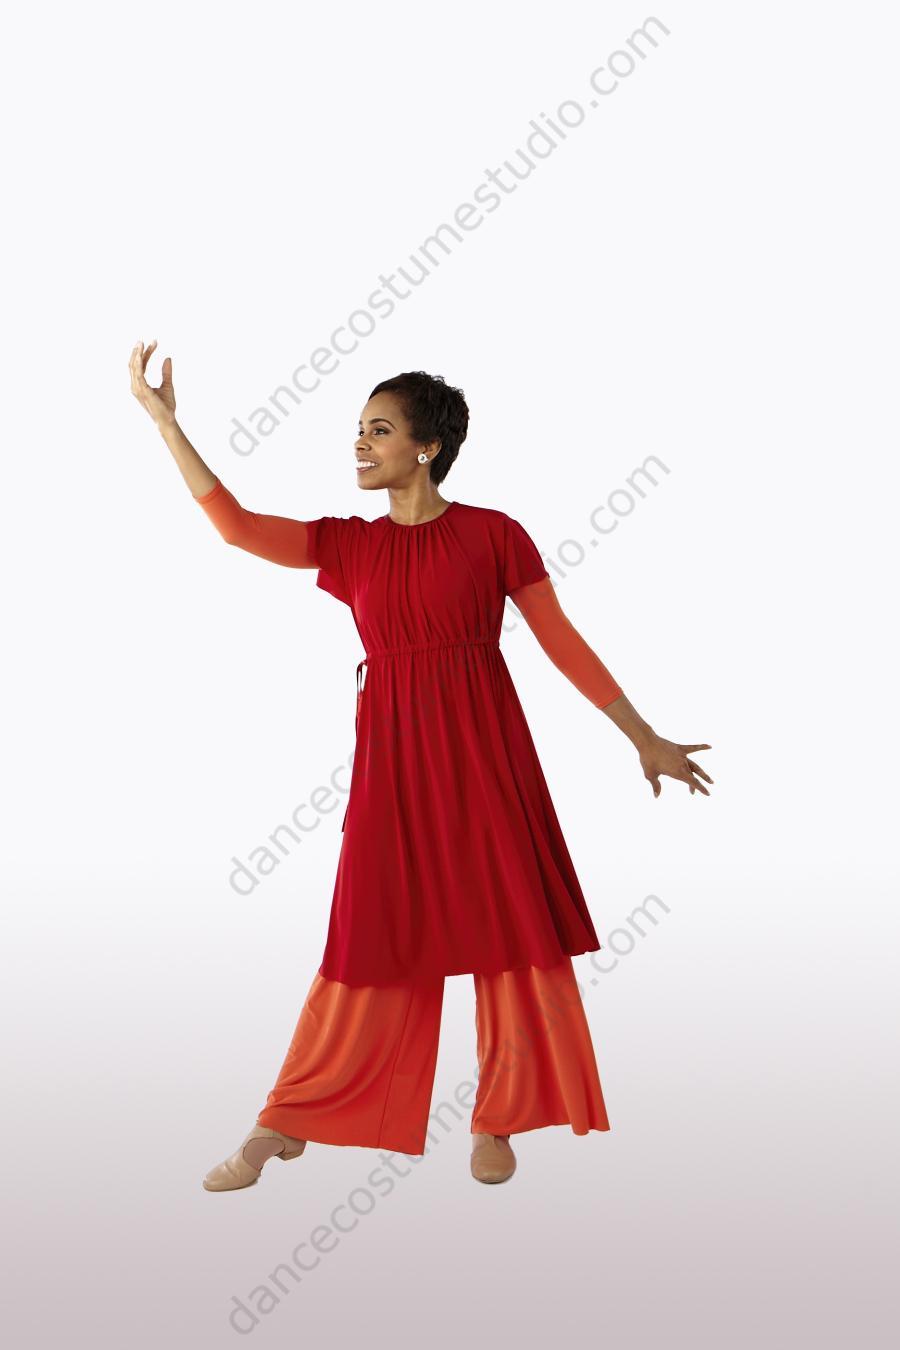 praise dance wear performing outfit design studio. Black Bedroom Furniture Sets. Home Design Ideas